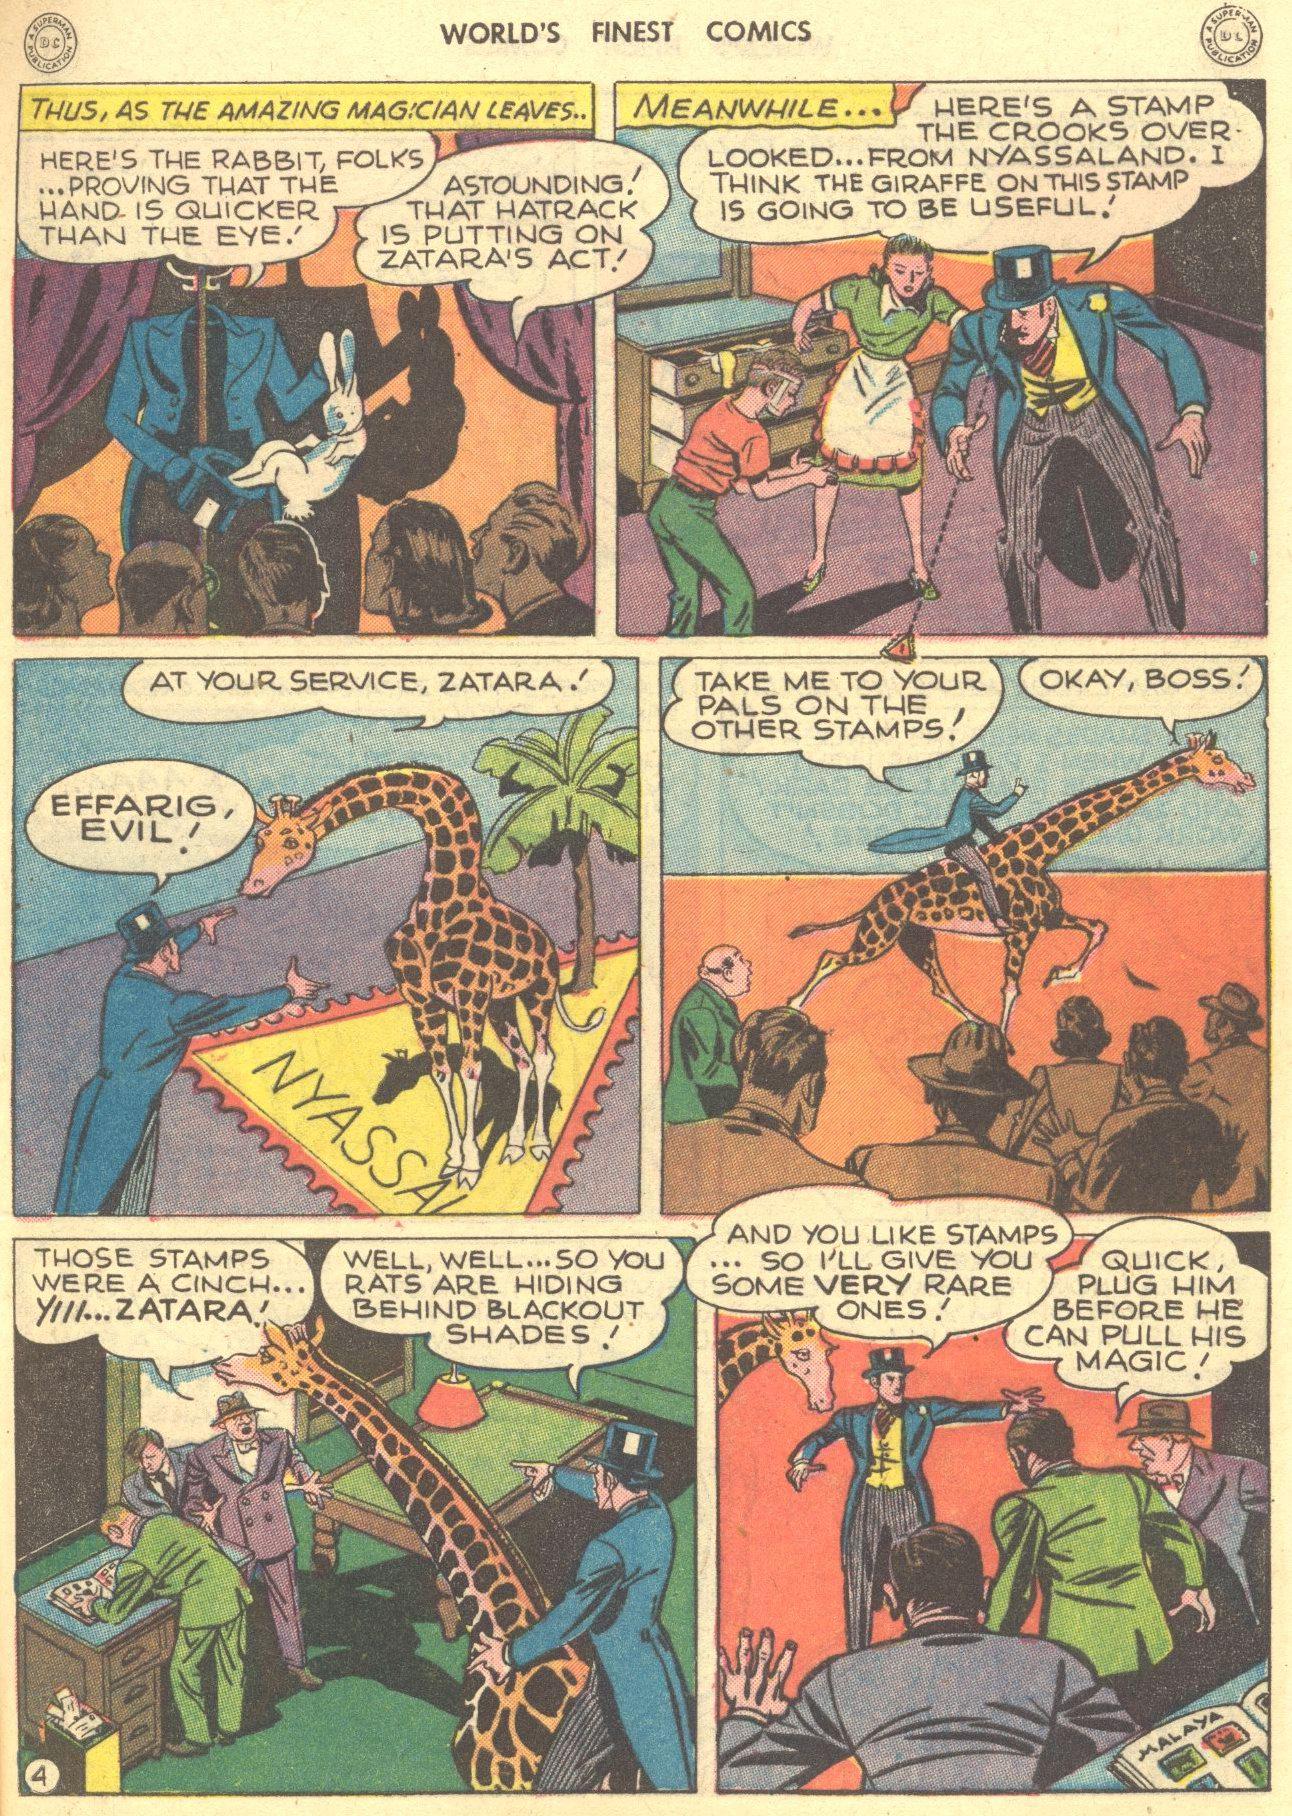 Read online World's Finest Comics comic -  Issue #28 - 46